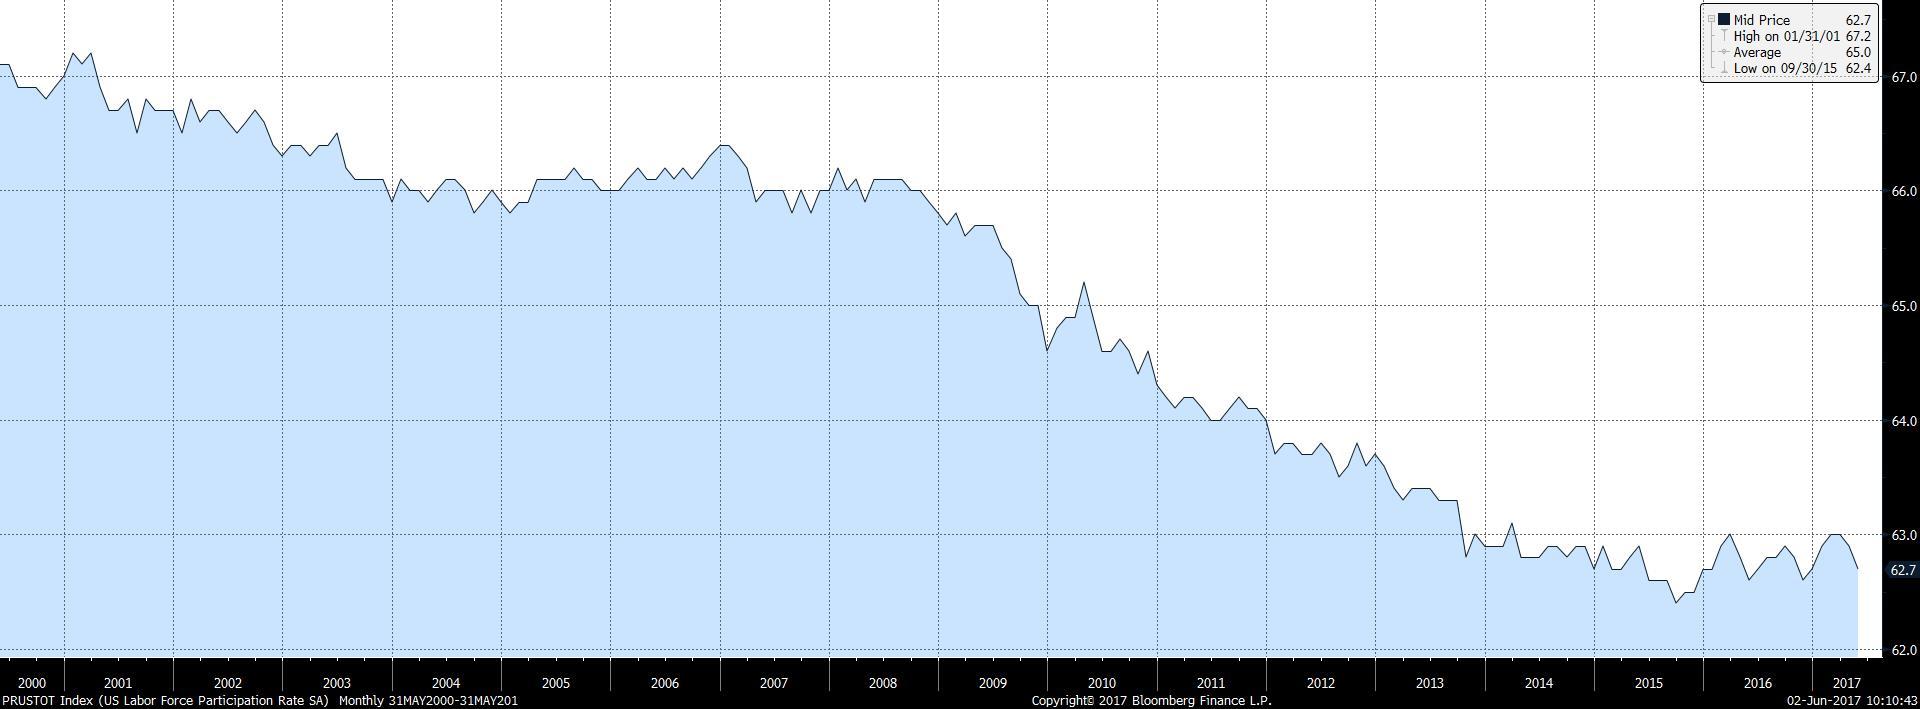 PRUSTOT Index (US Labor Force Pa 2017-06-02 10-10-41